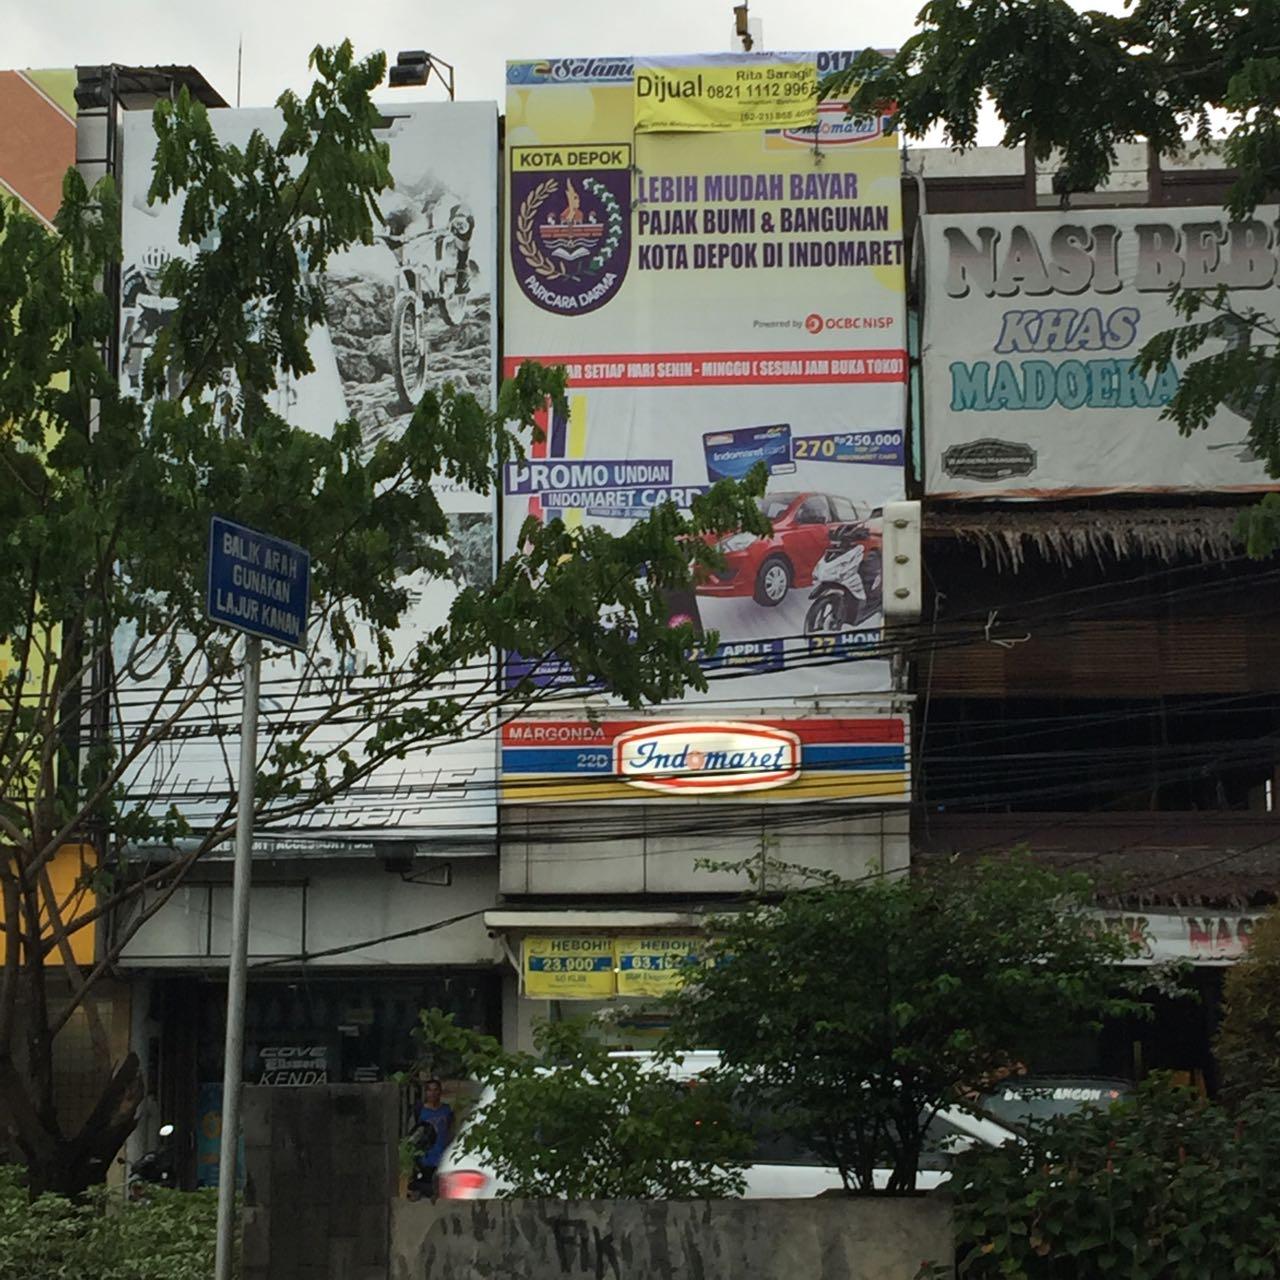 Dijual Ruko di Pusat Kota Depok